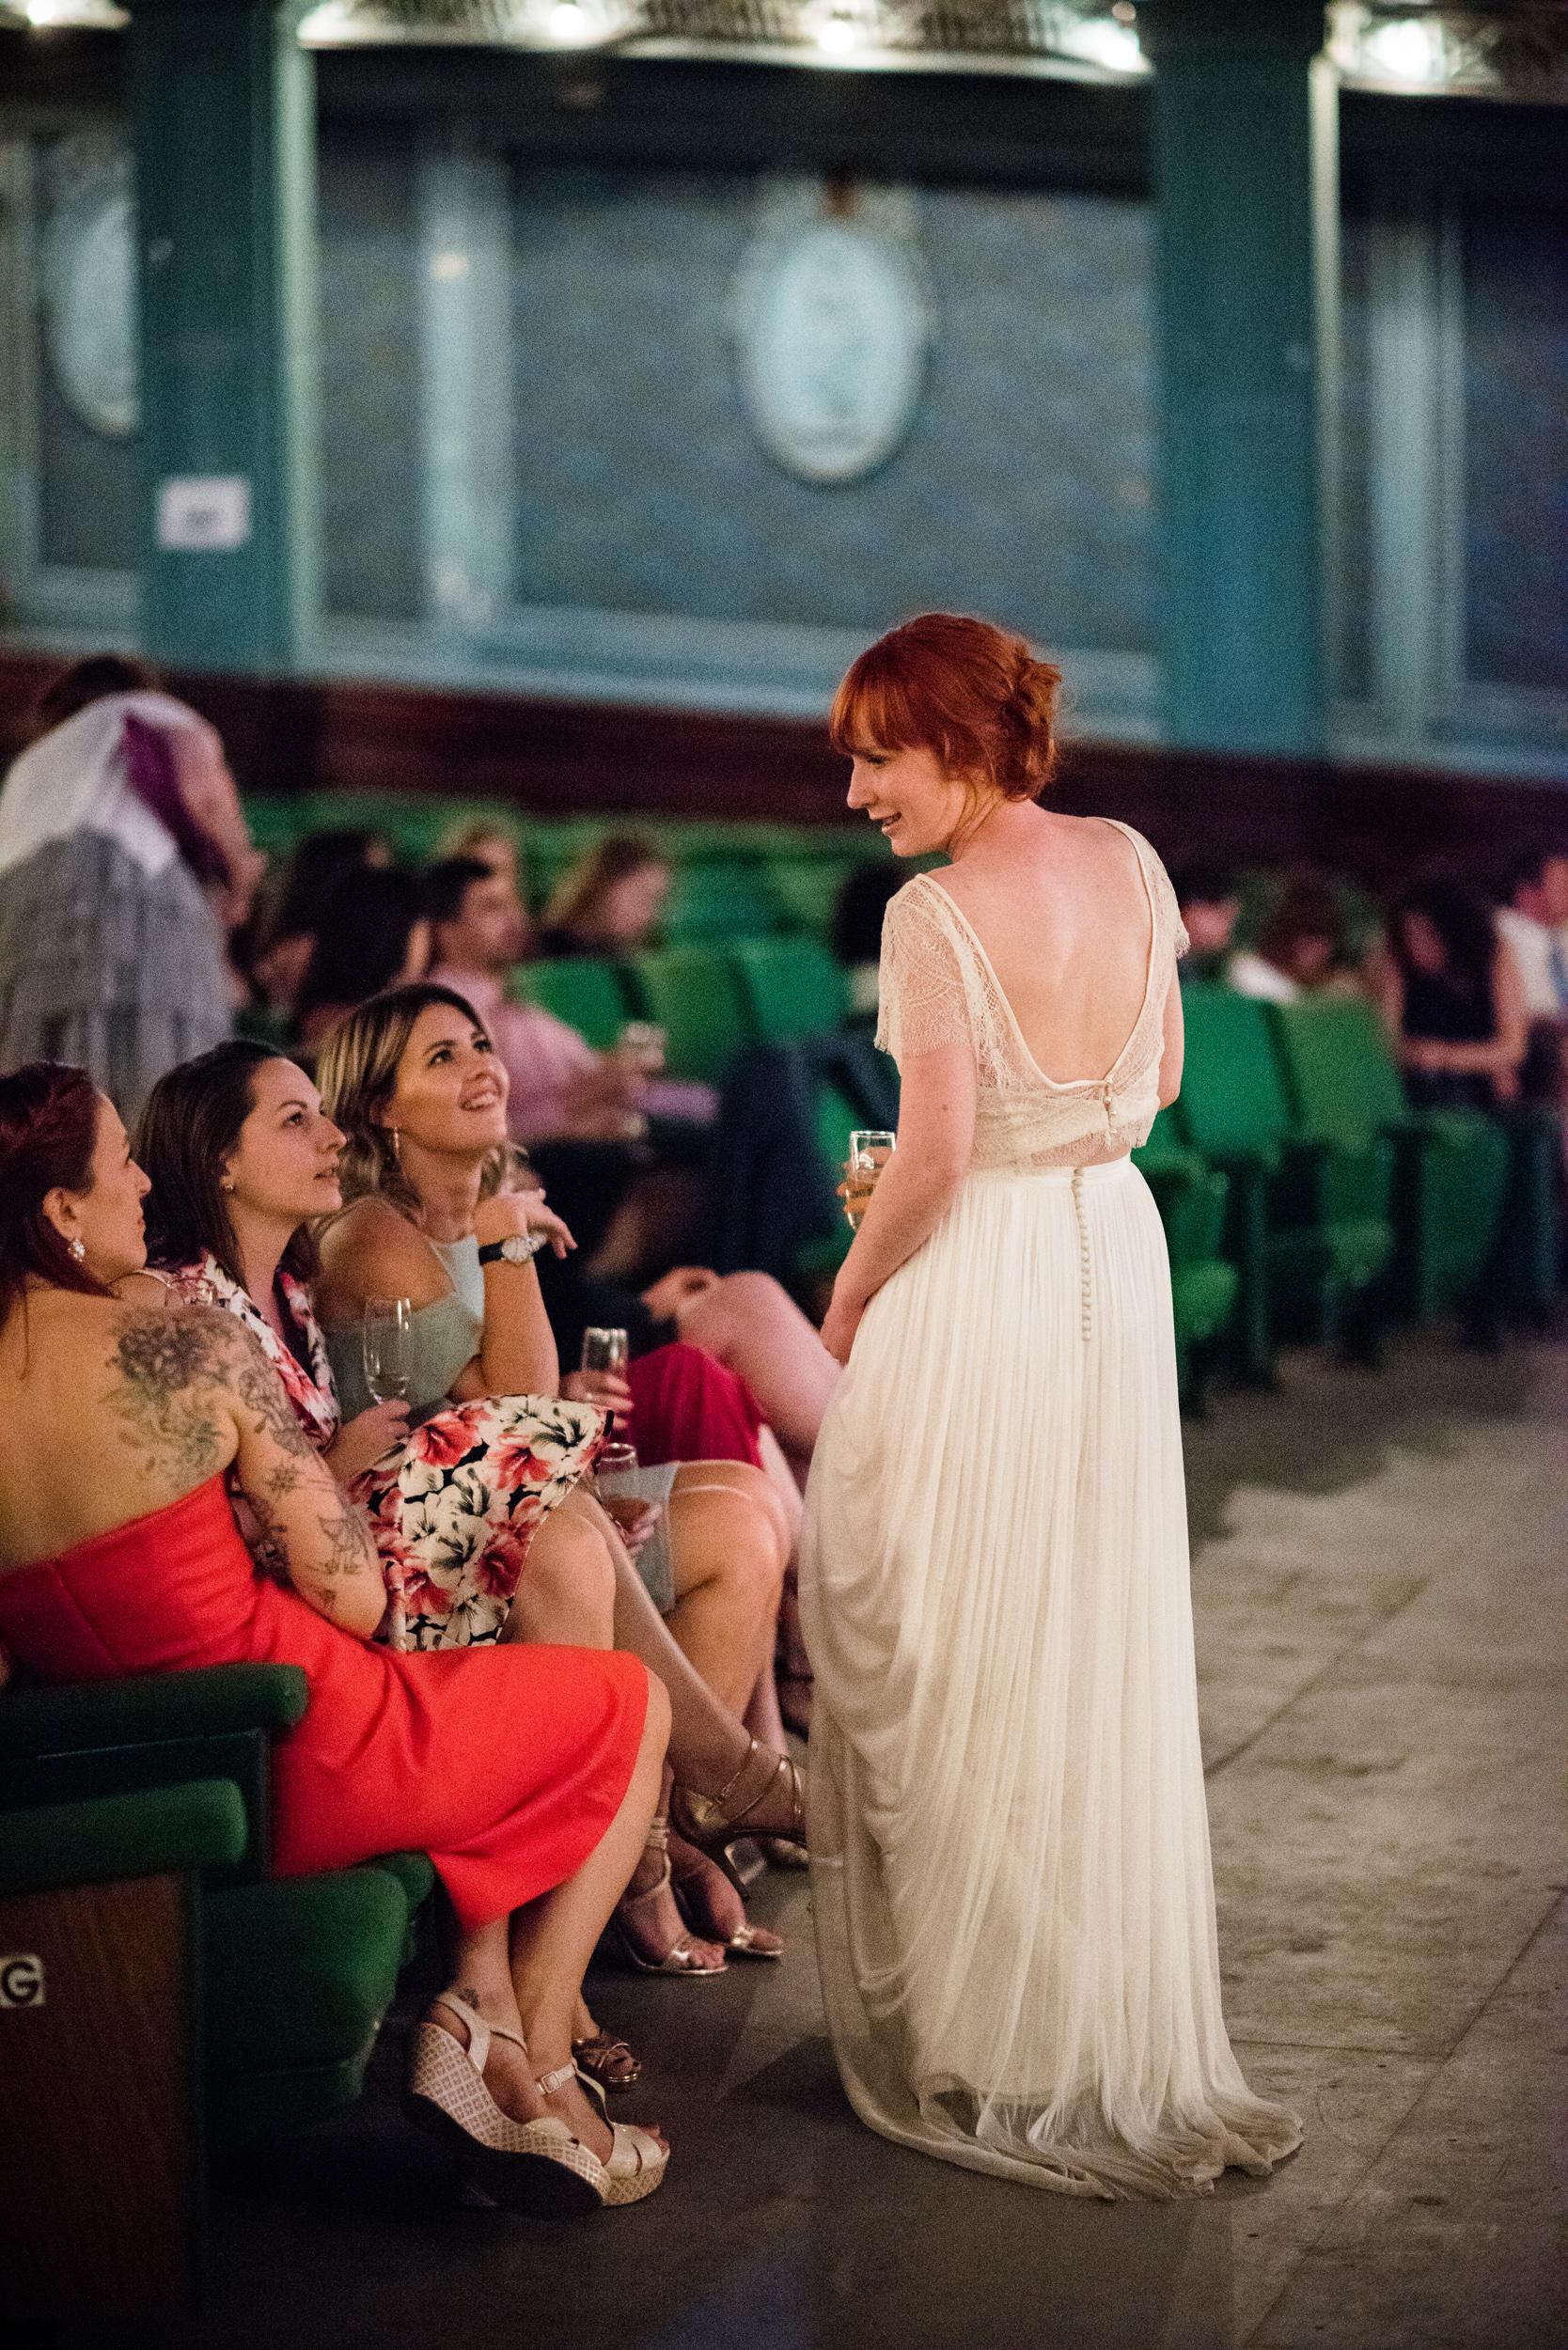 Jill-Kate-Beaumont-Lace-Sheffield-Wedding-25.jpg